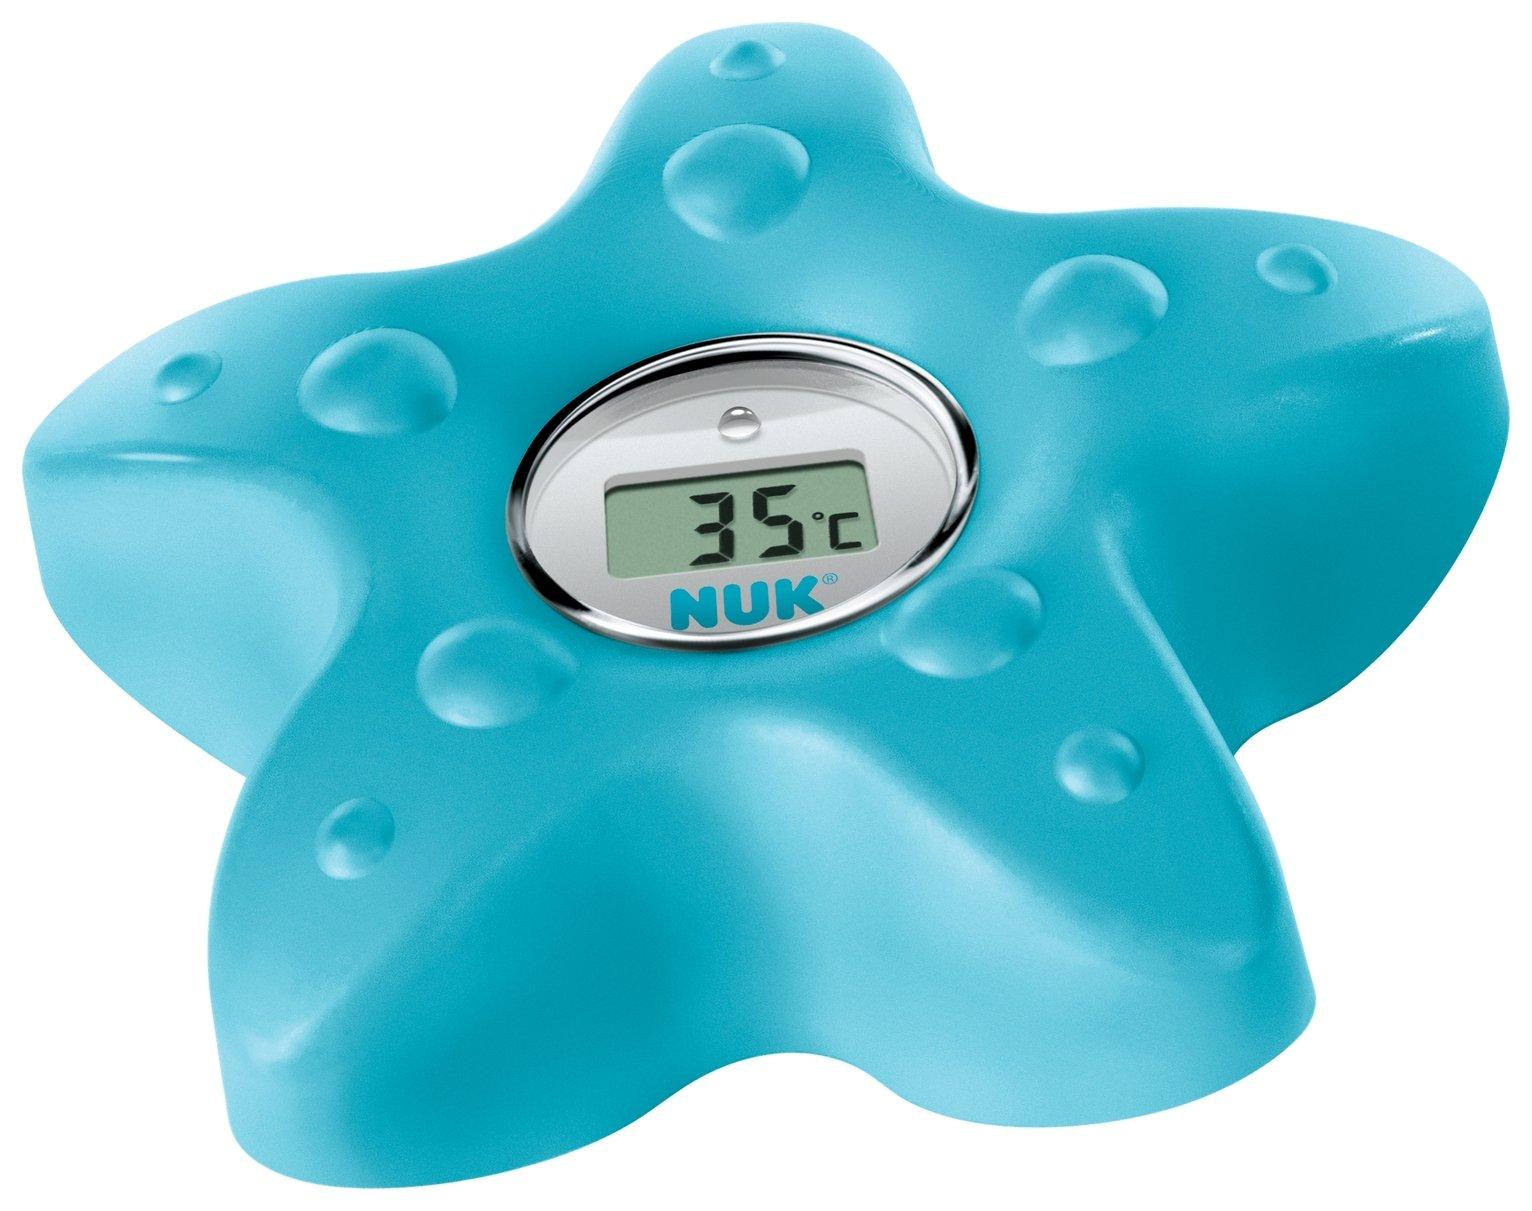 NUK Digital Bath Thermometer - Blue